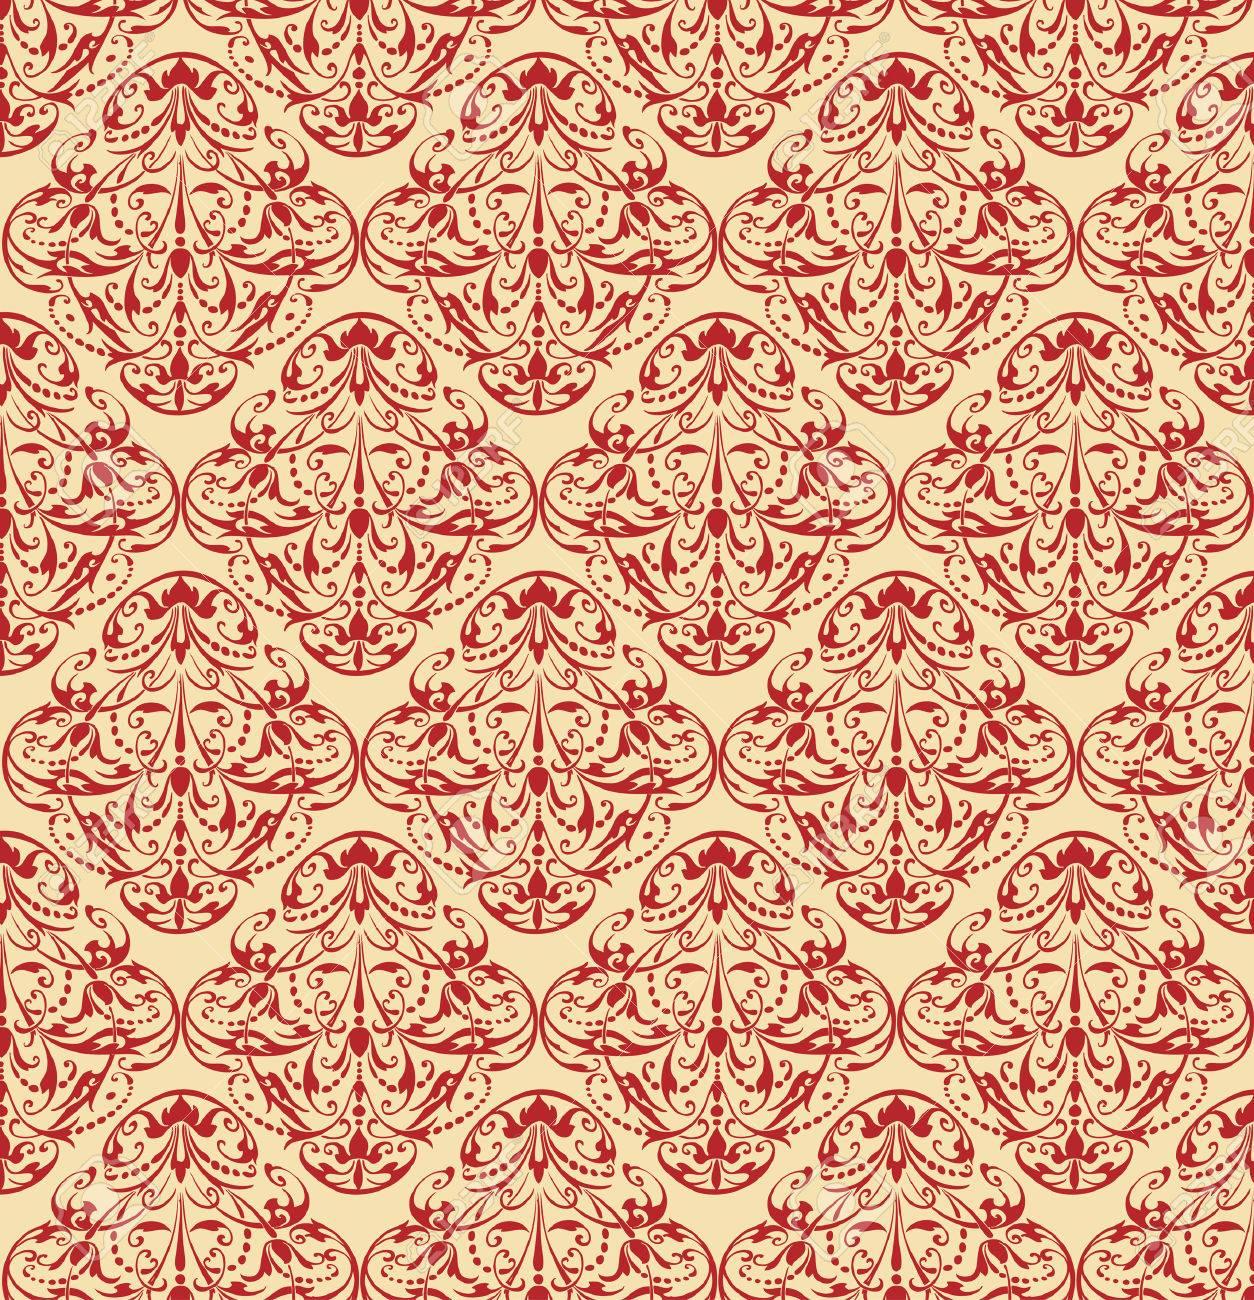 papel tapiz barroco repetida foto de archivo